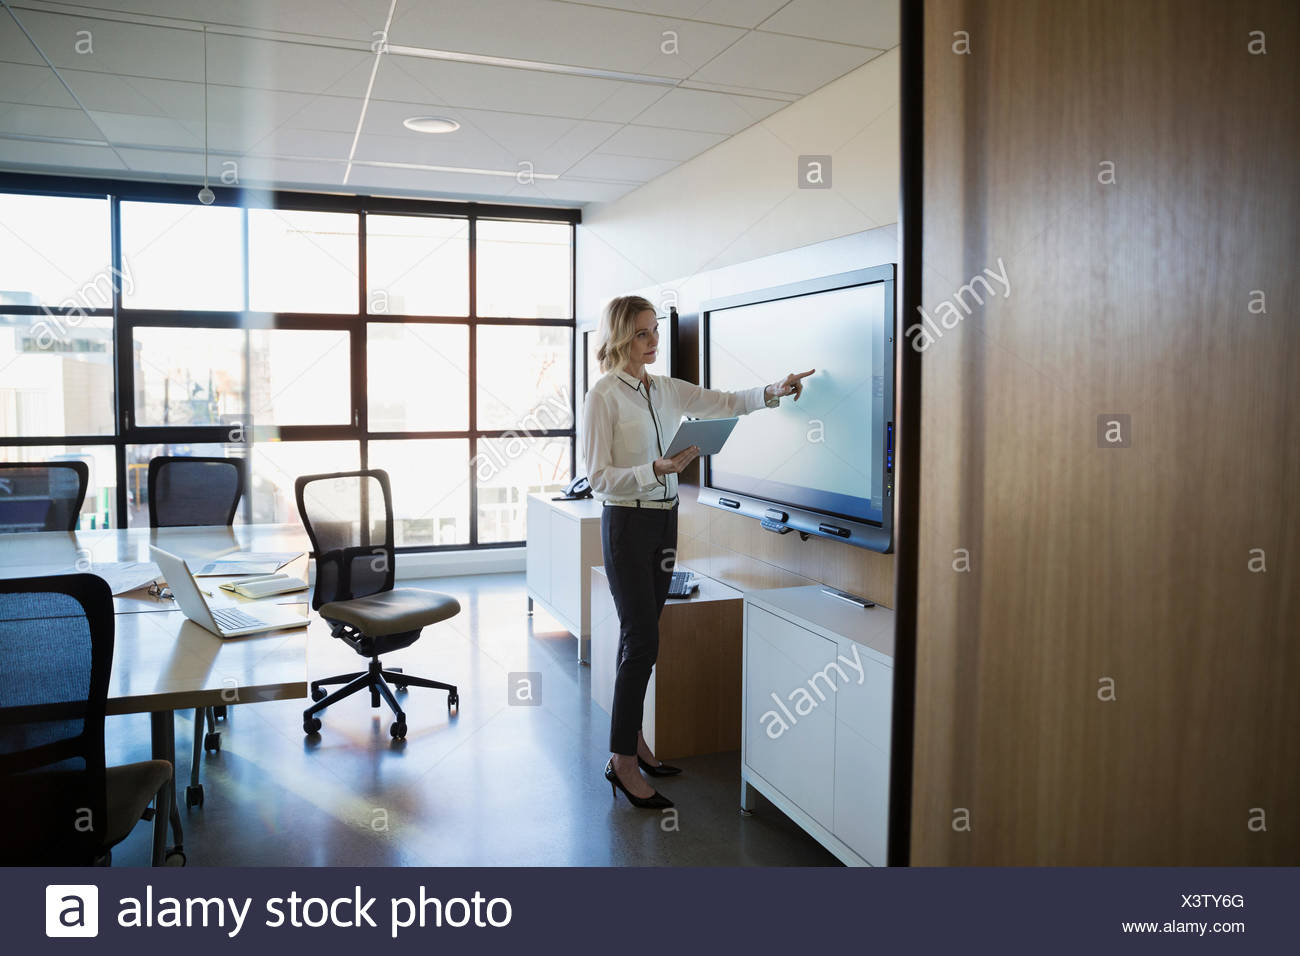 La empresaria tableta digital con la pantalla táctil la sala Imagen De Stock